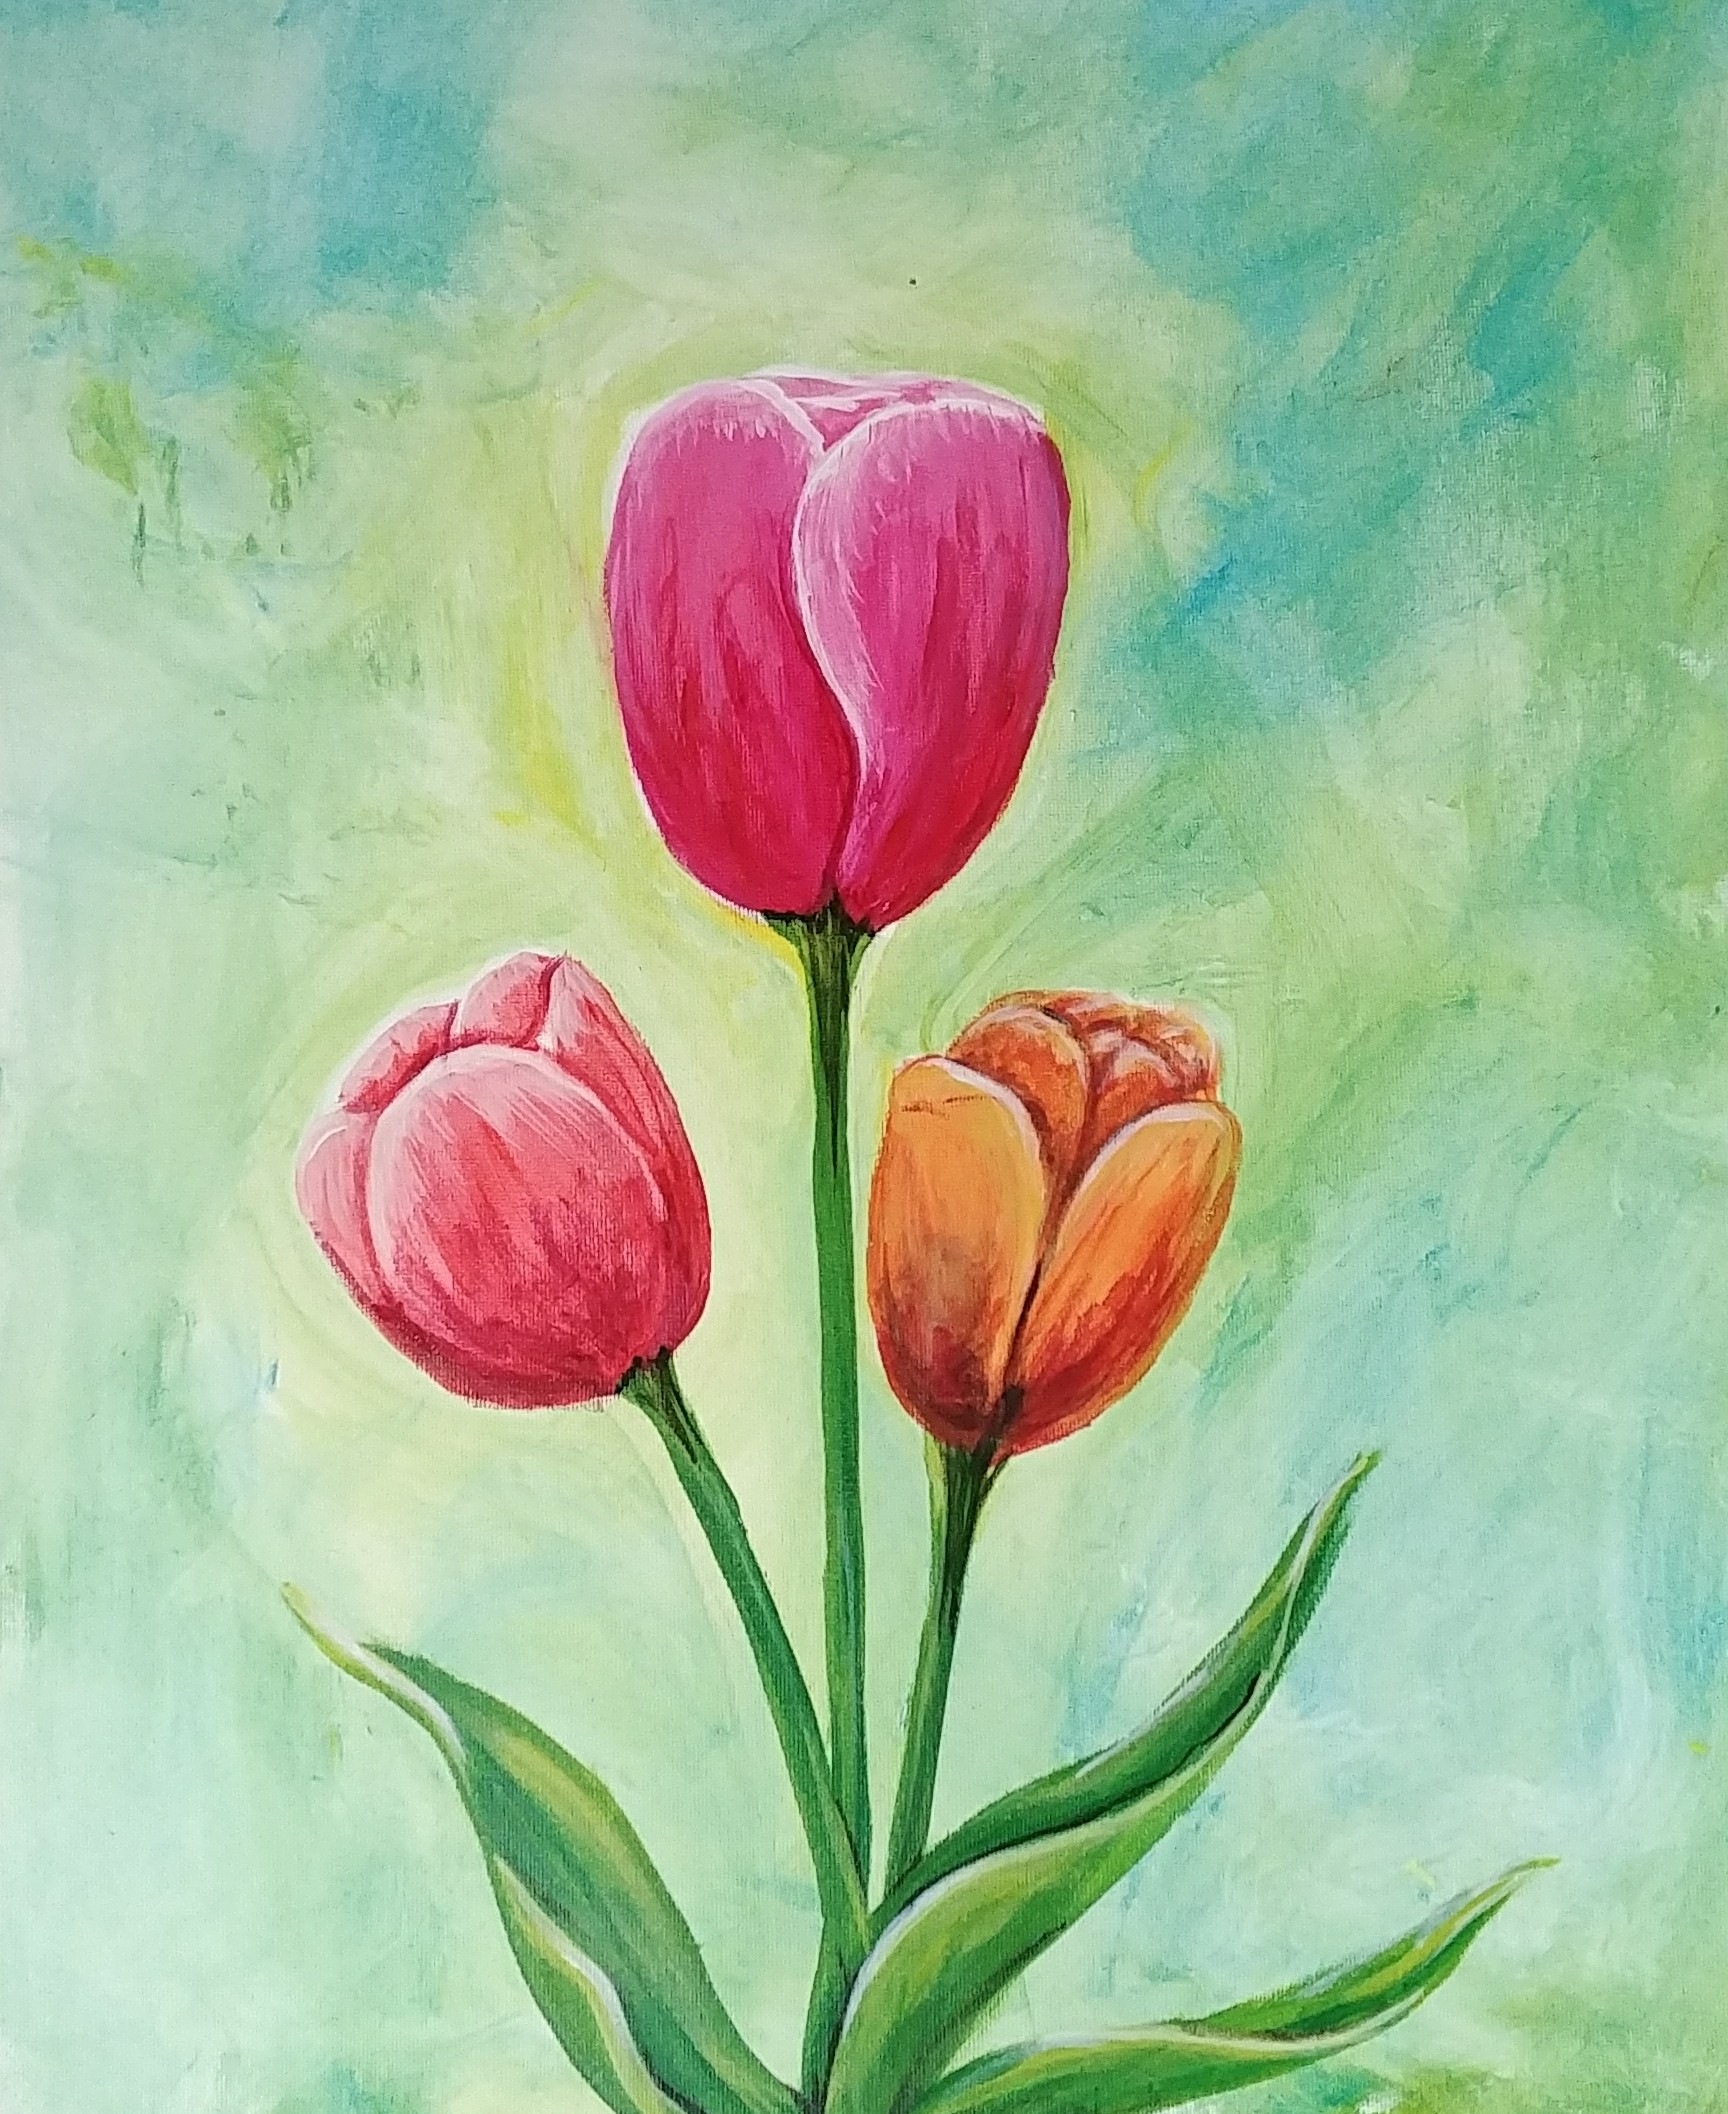 When Tulips Bloom